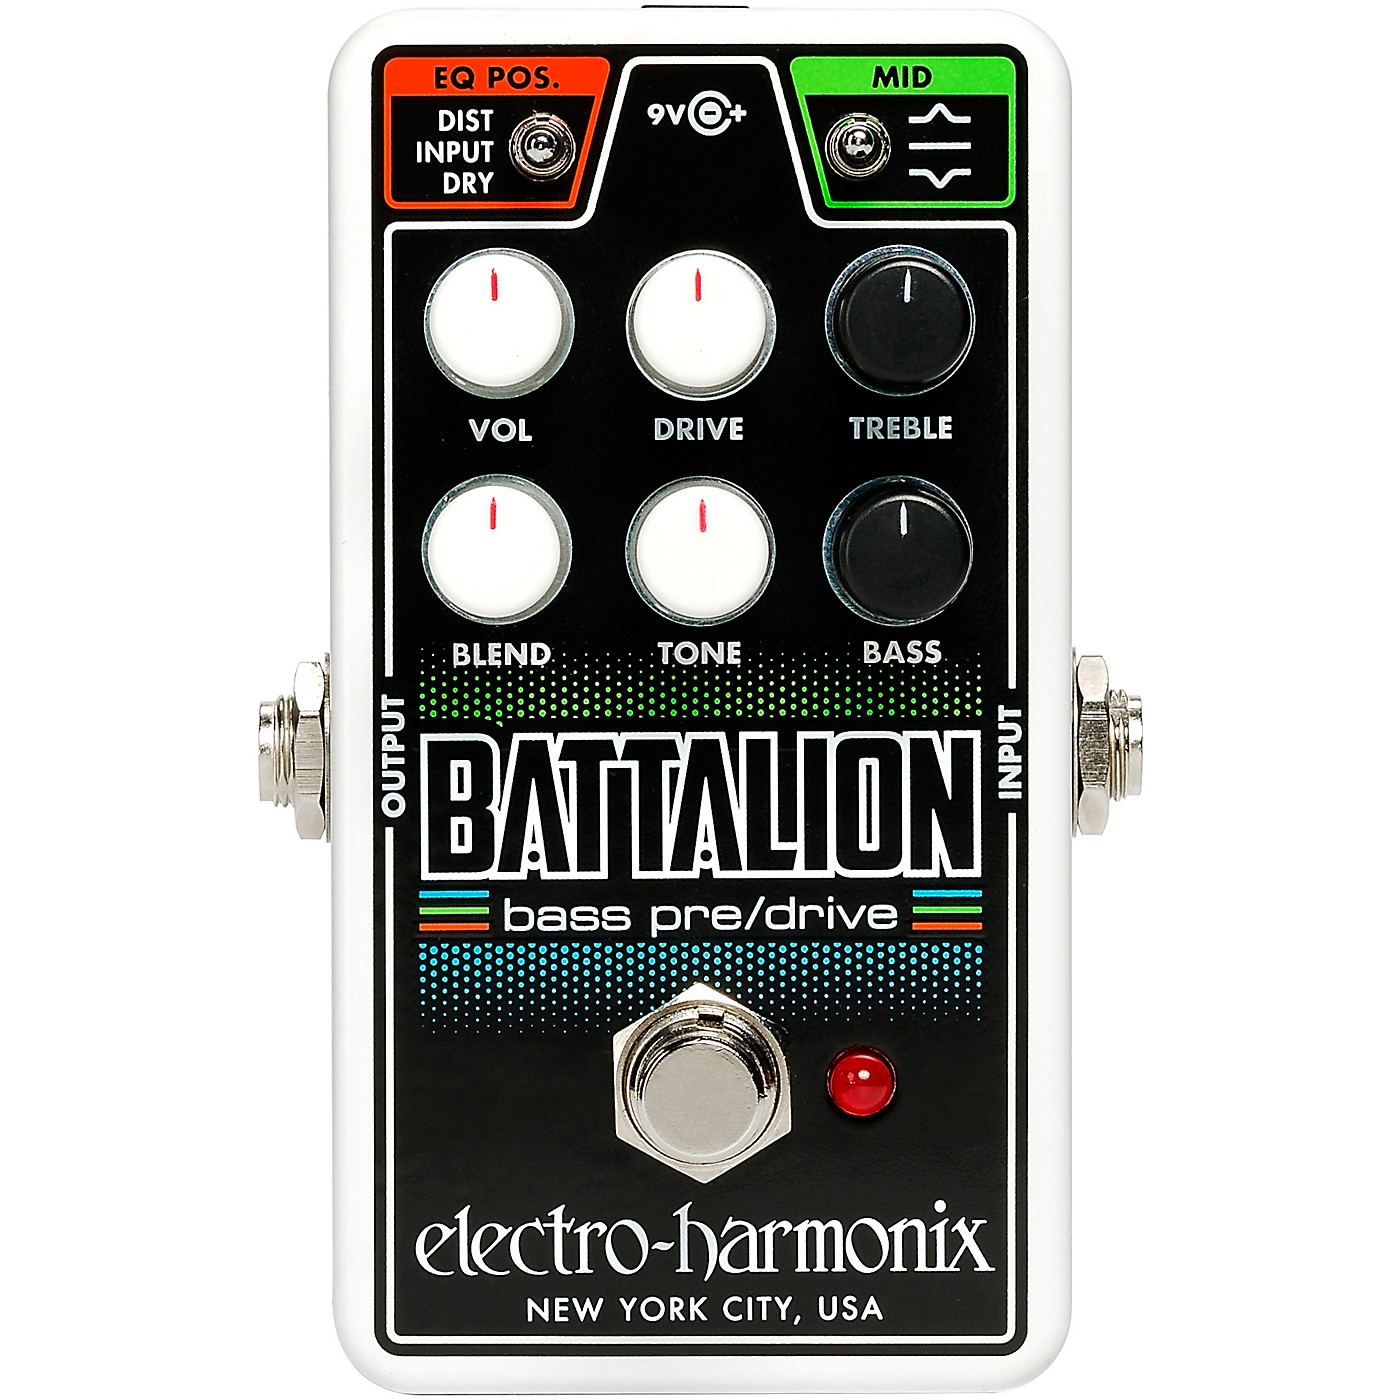 Electro-Harmonix Nano Battalion Bass Preamp & Overdrive Effects Pedal thumbnail